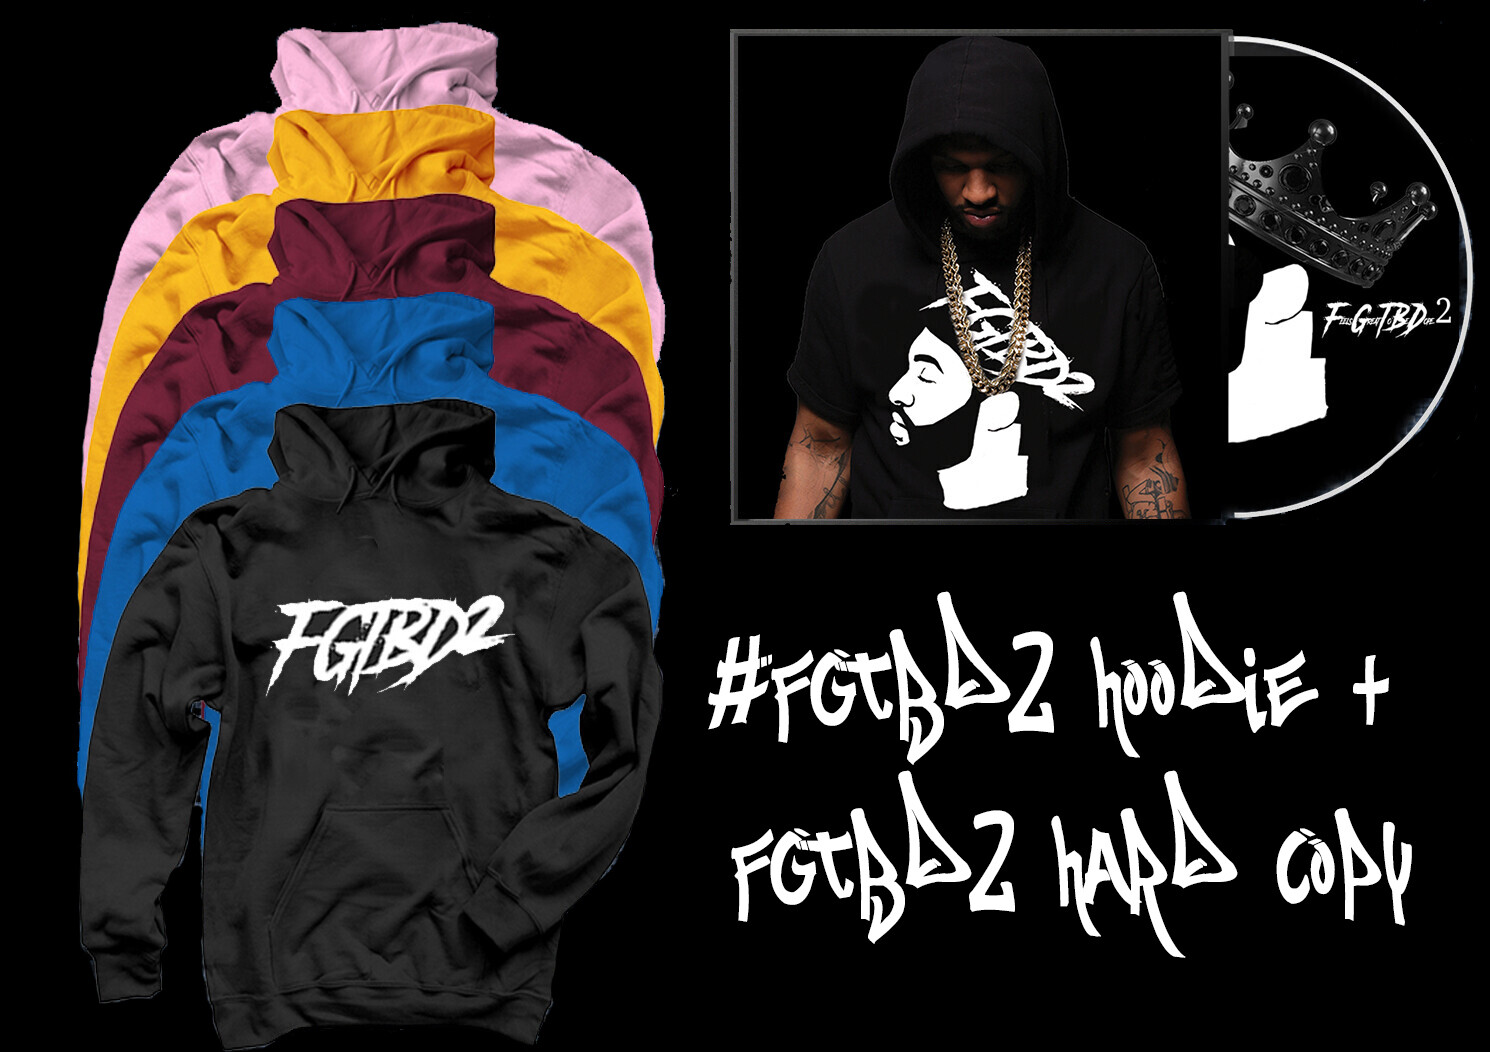 ($33 OFF) #FGTBD2 Hoodie + FGTBD2 Hard Copy + FREE GIFT